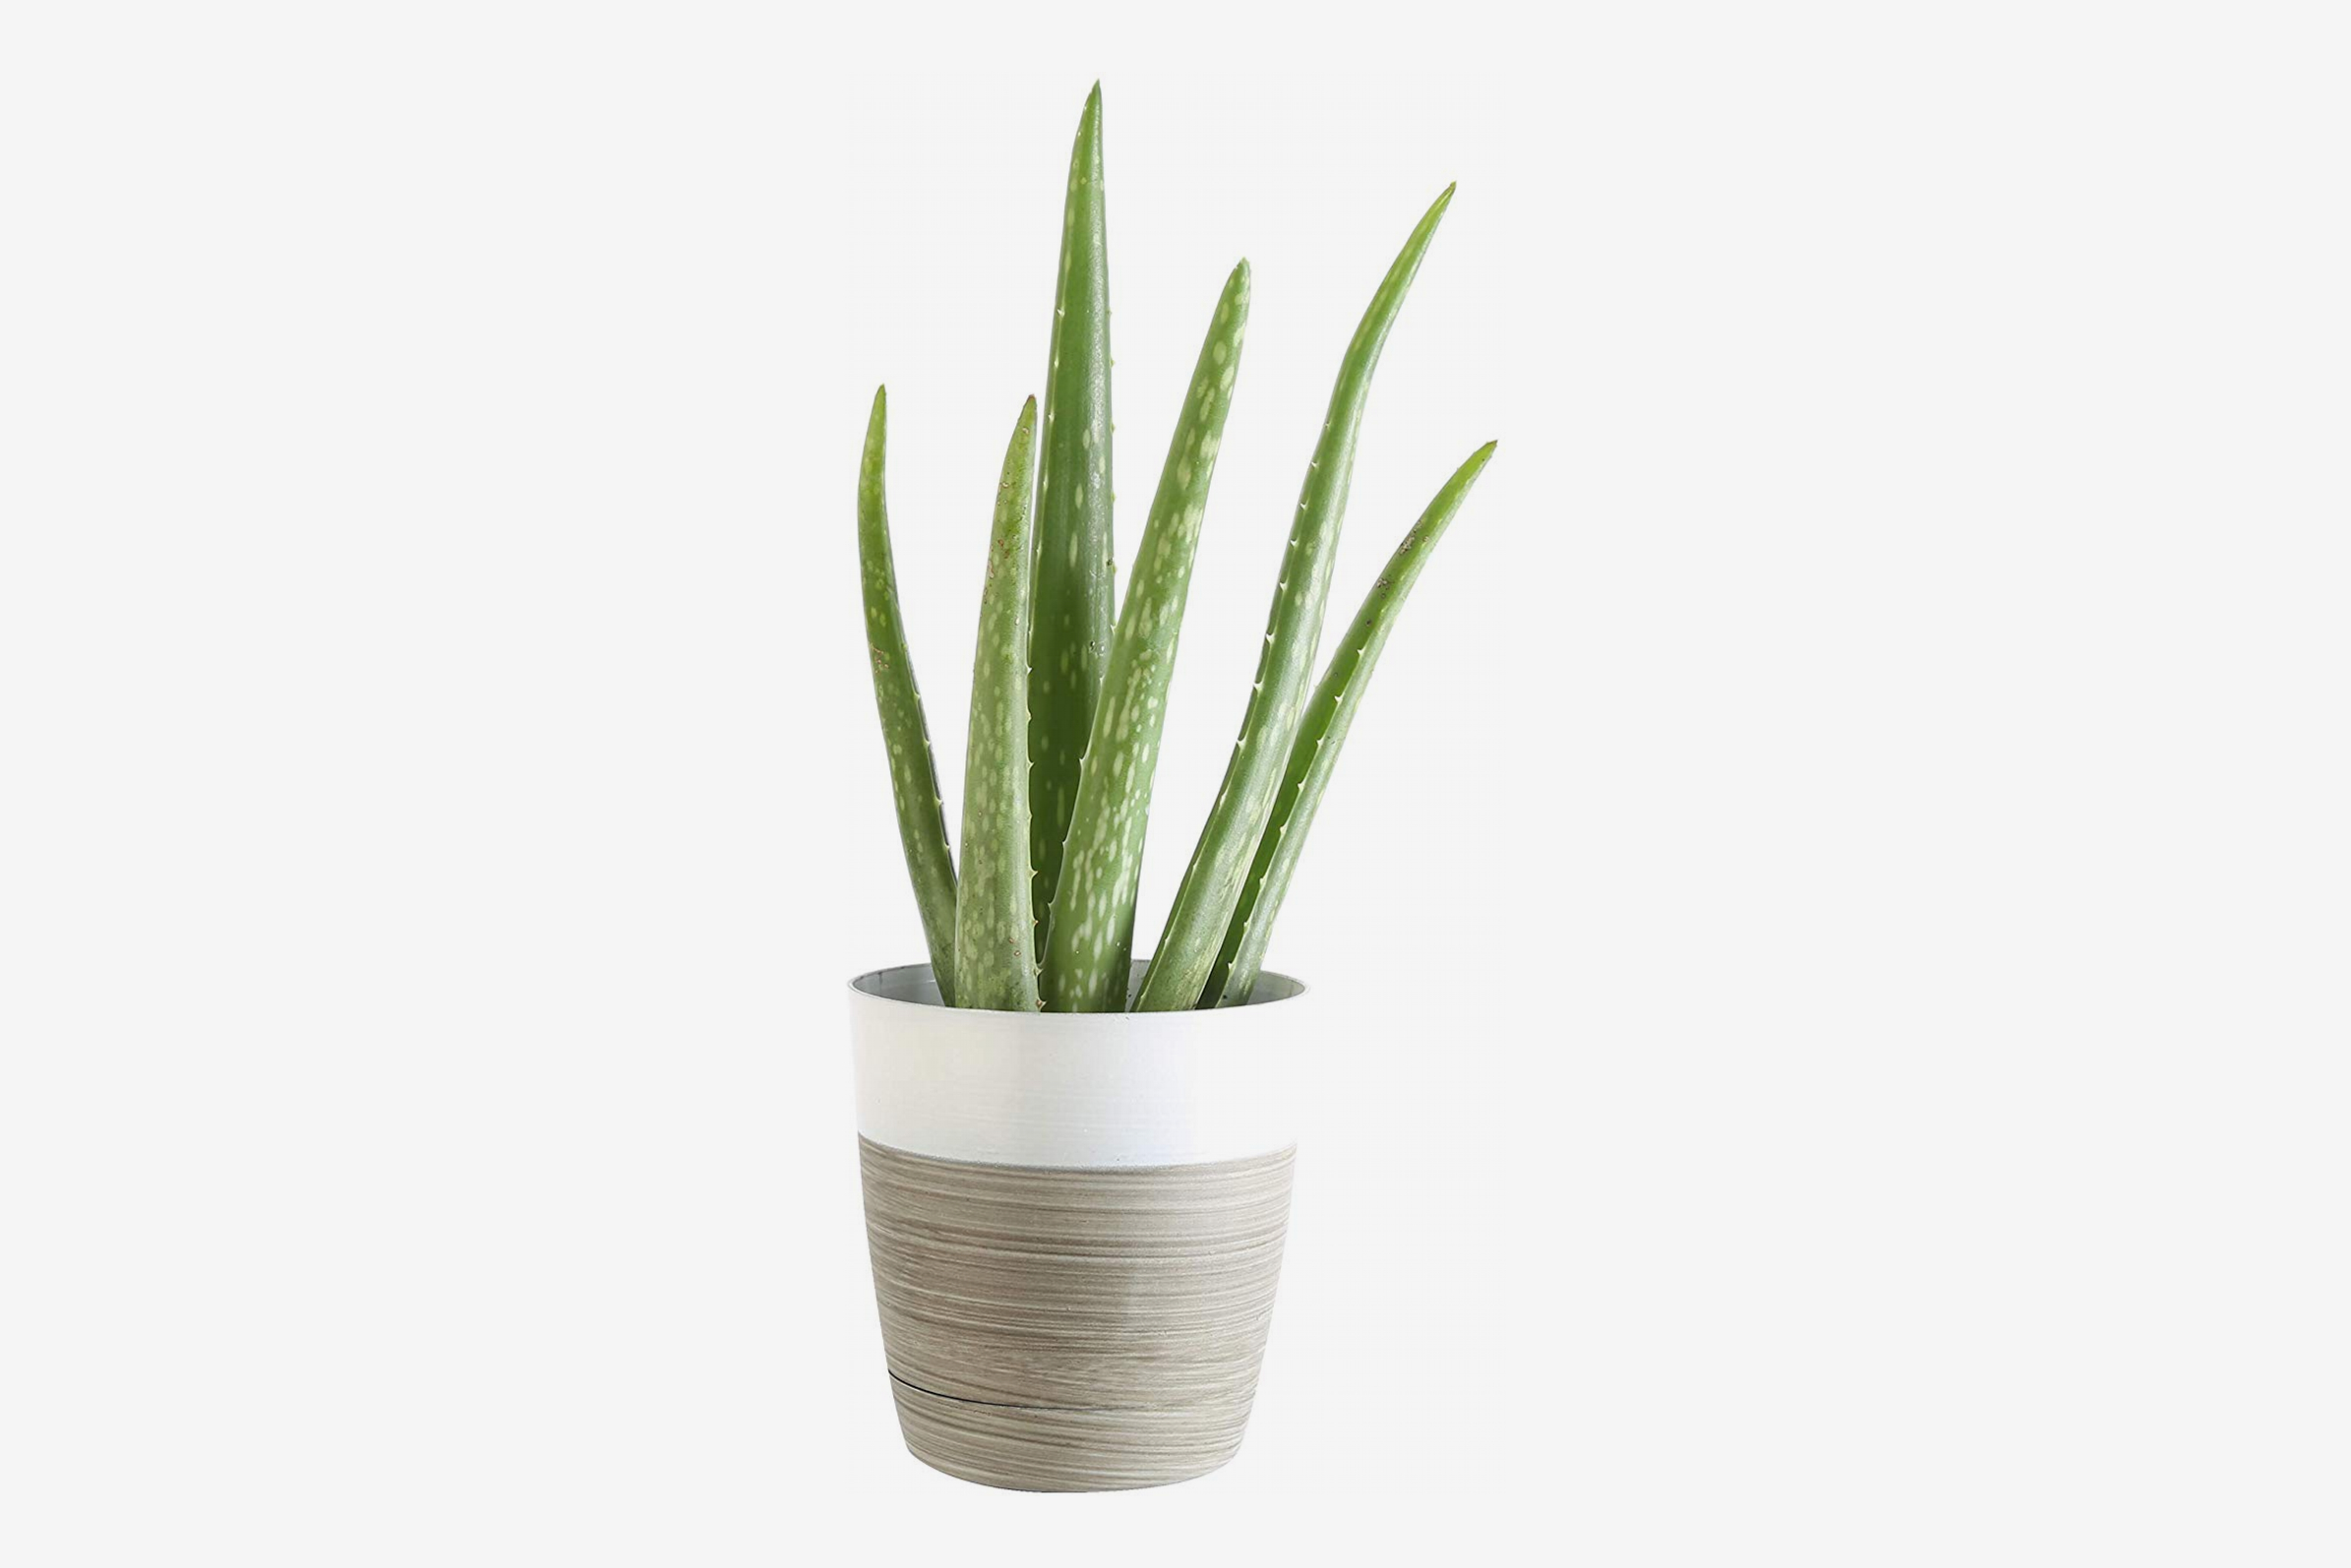 Costa Farms Aloe Vera Live Indoor House Plant, 10-Inch, White-Natural Planter